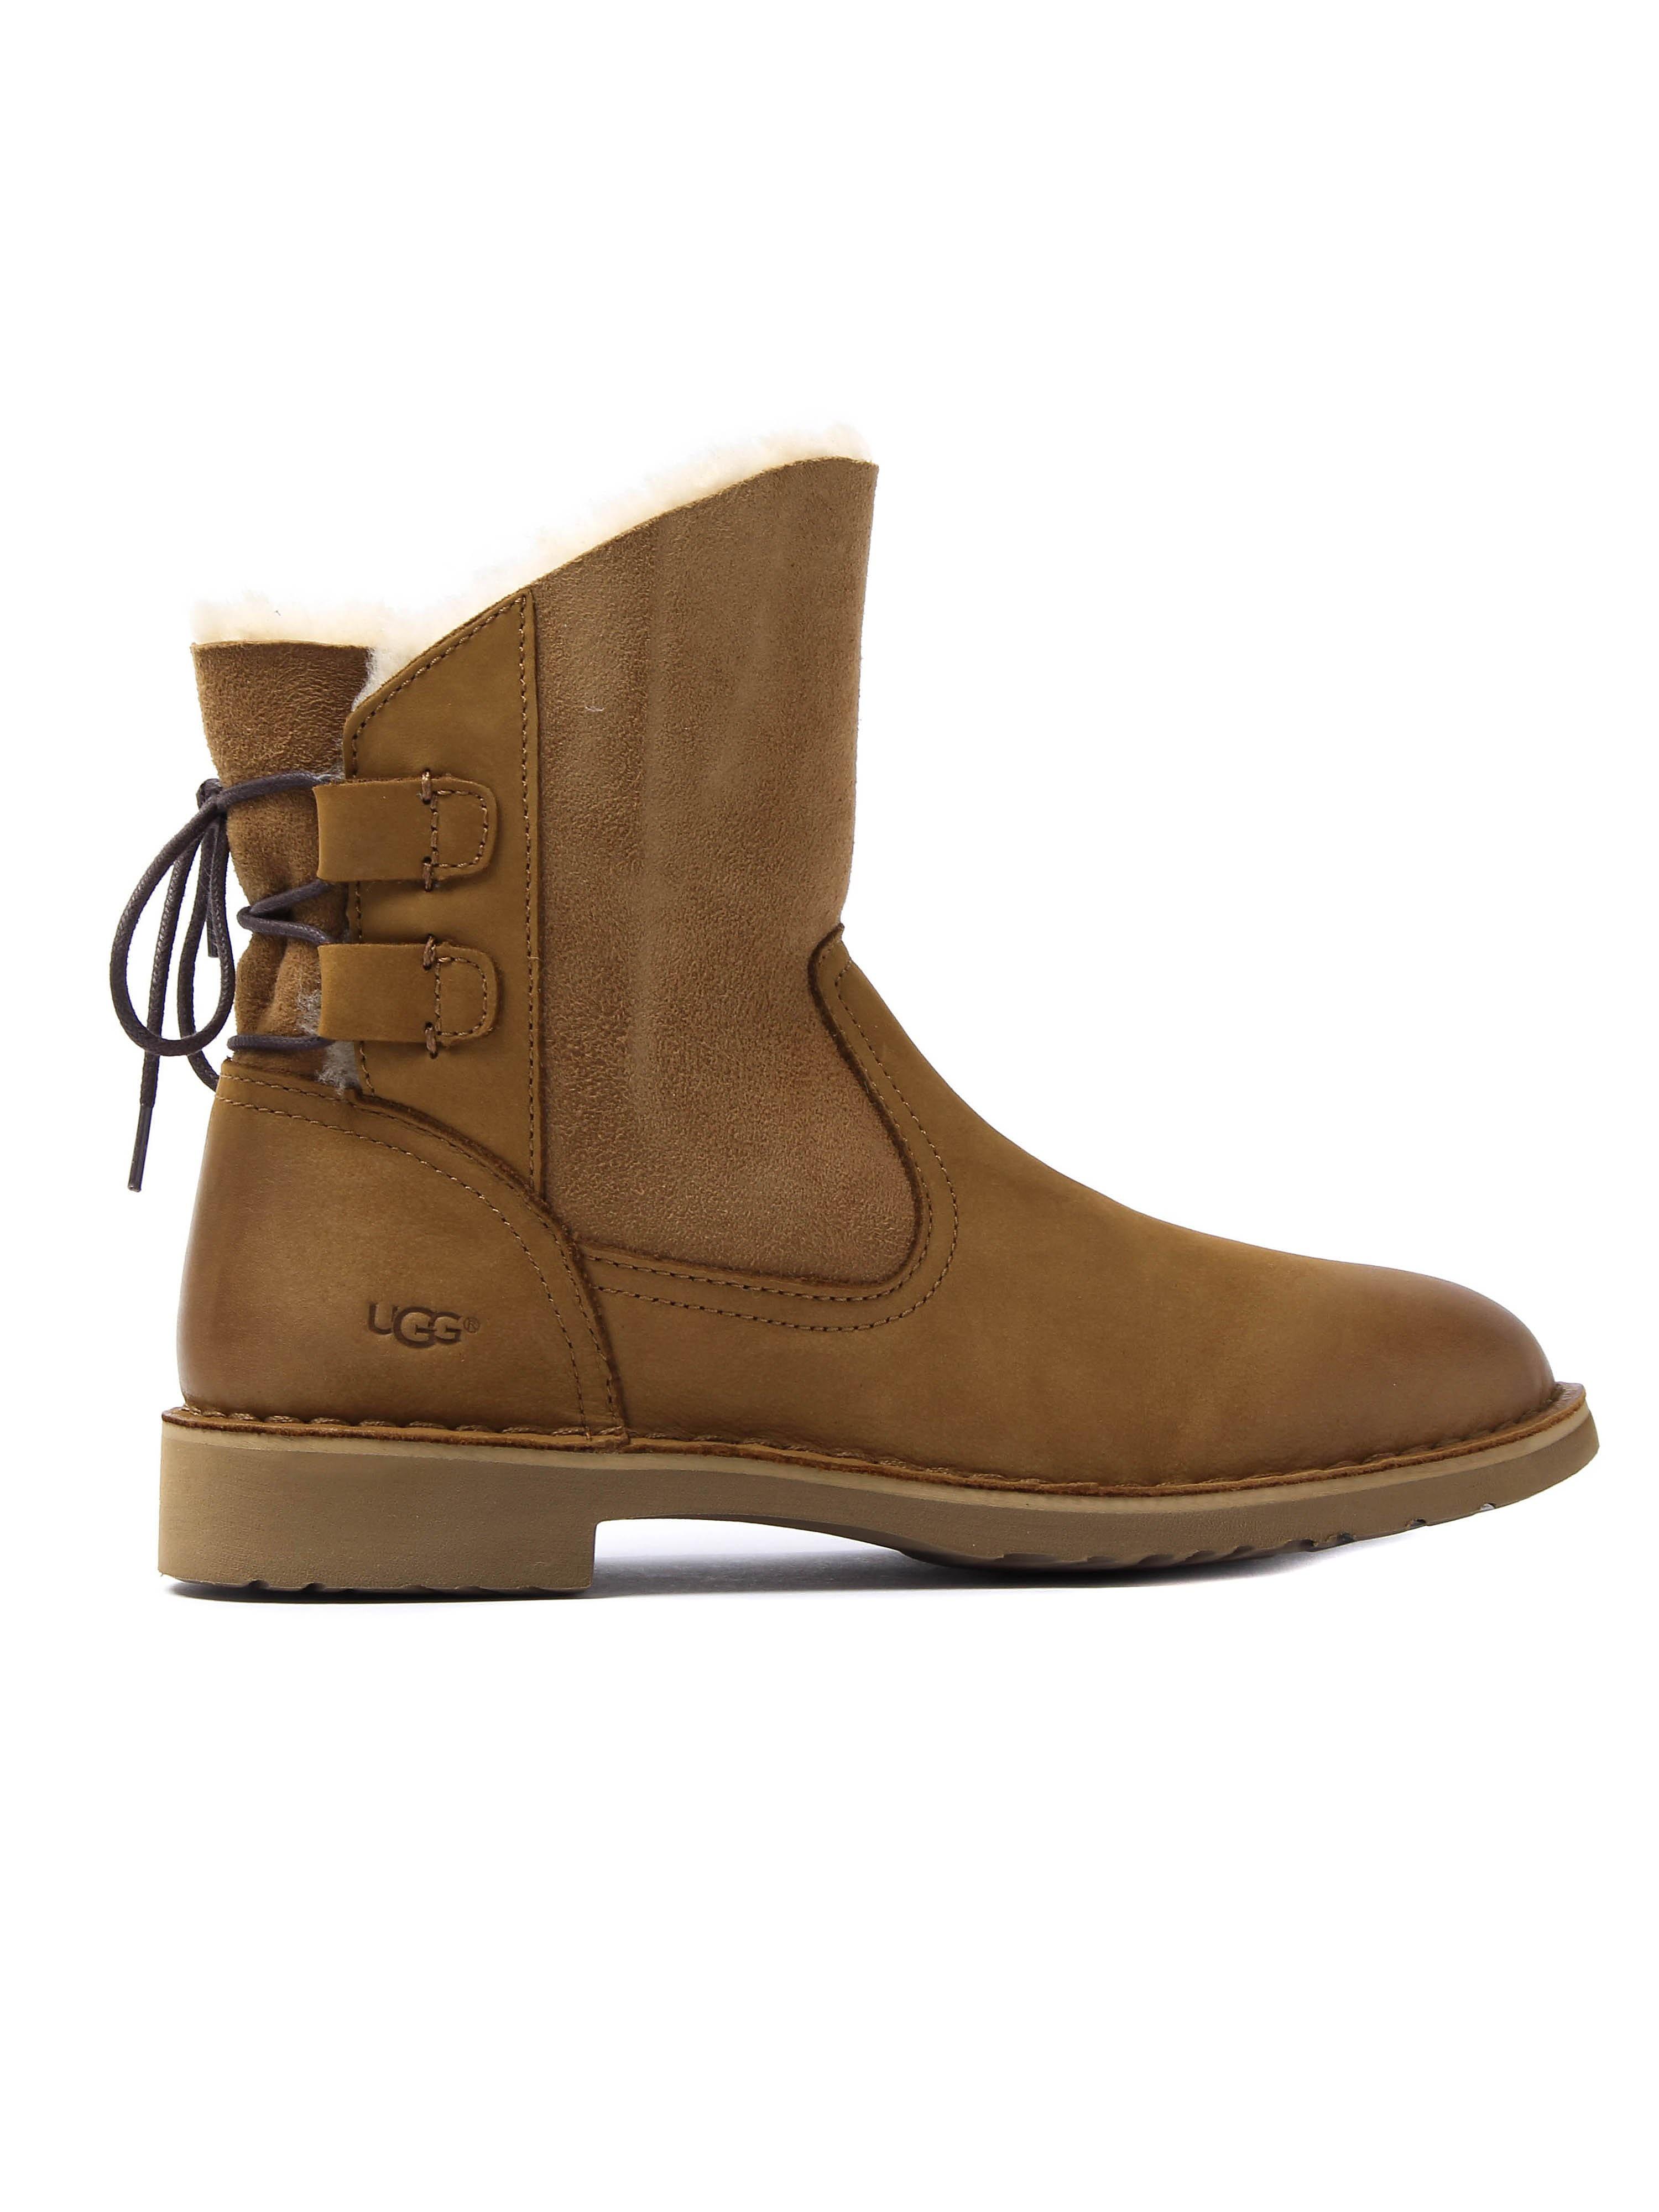 UGG Women's Naiyah Twinface Boots - Chestnut